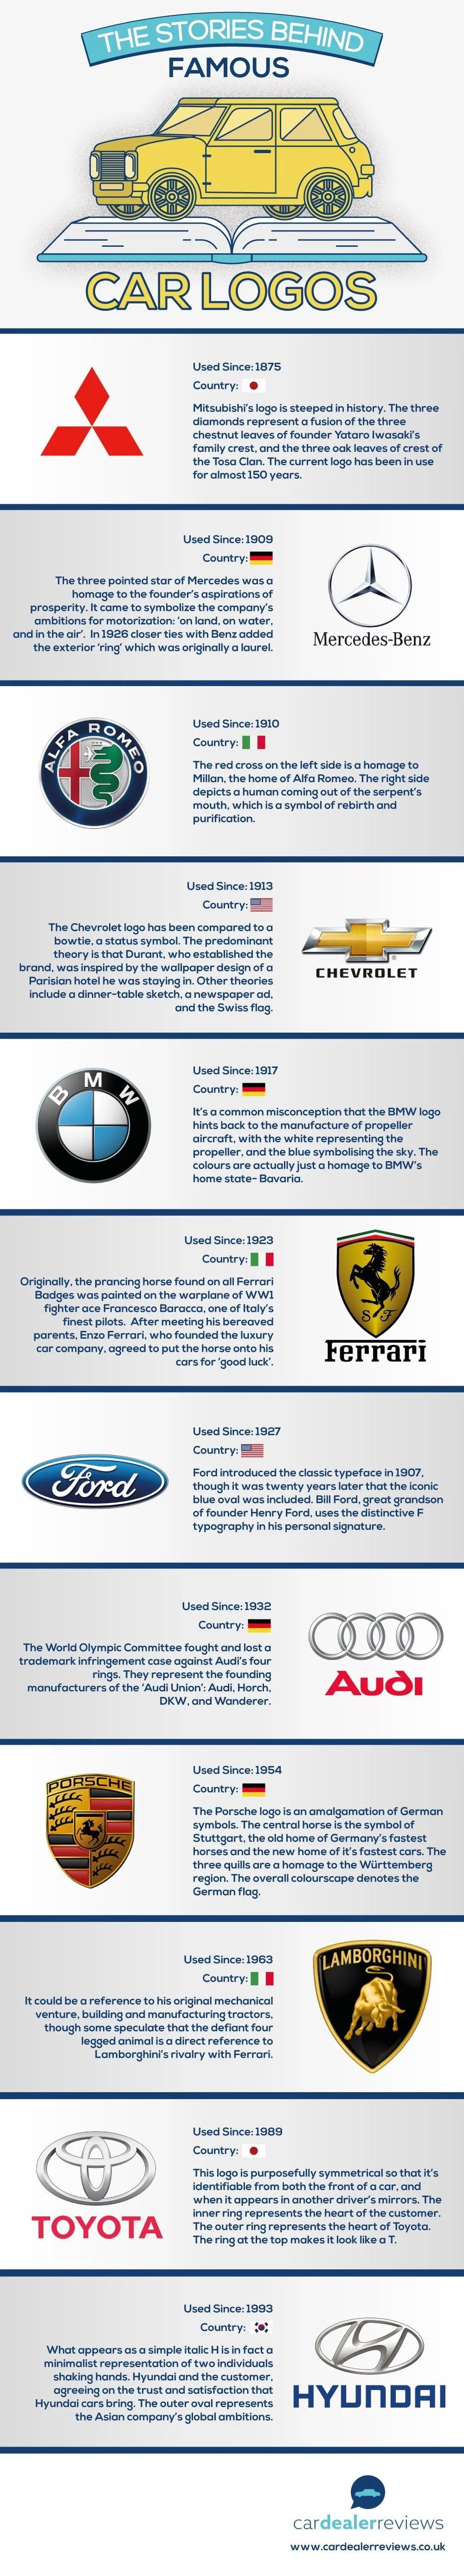 the-famous-car-brand-logos